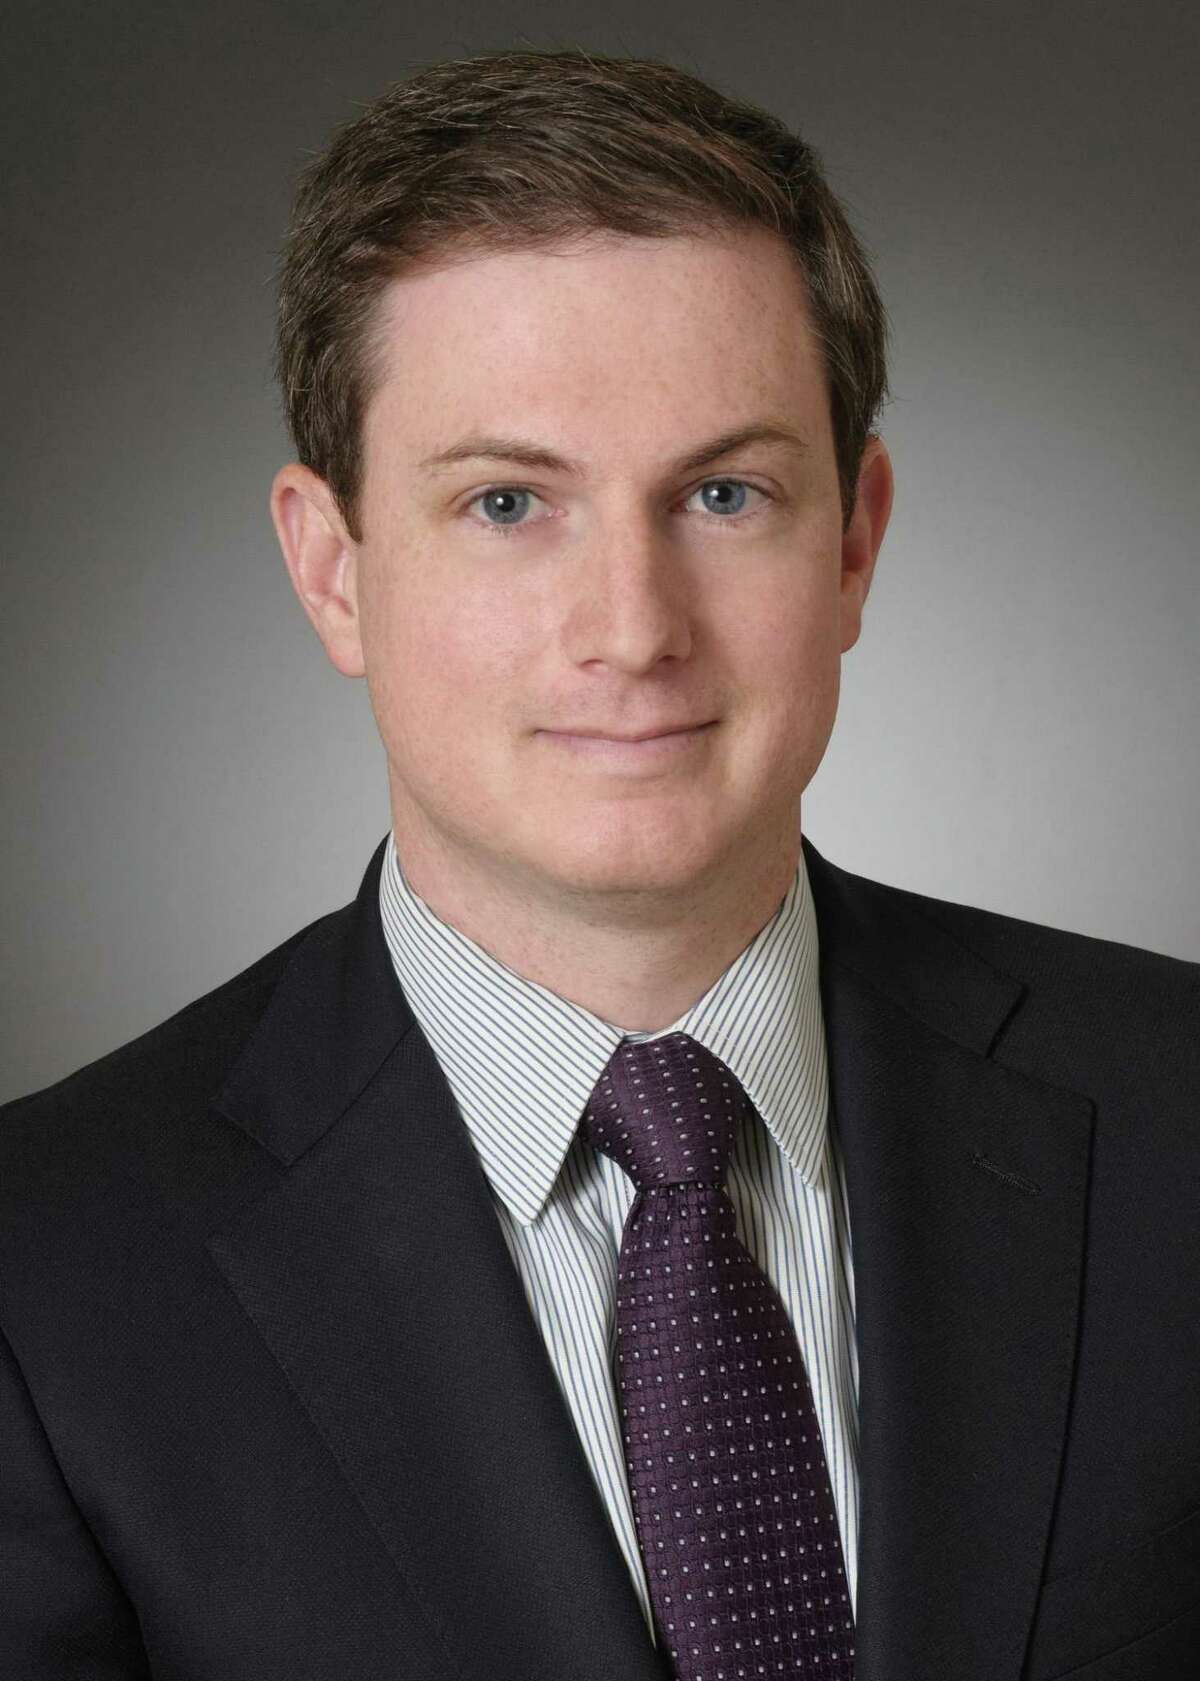 Brian Schartz, a partner in the Houston office of Kirkland & Ellis